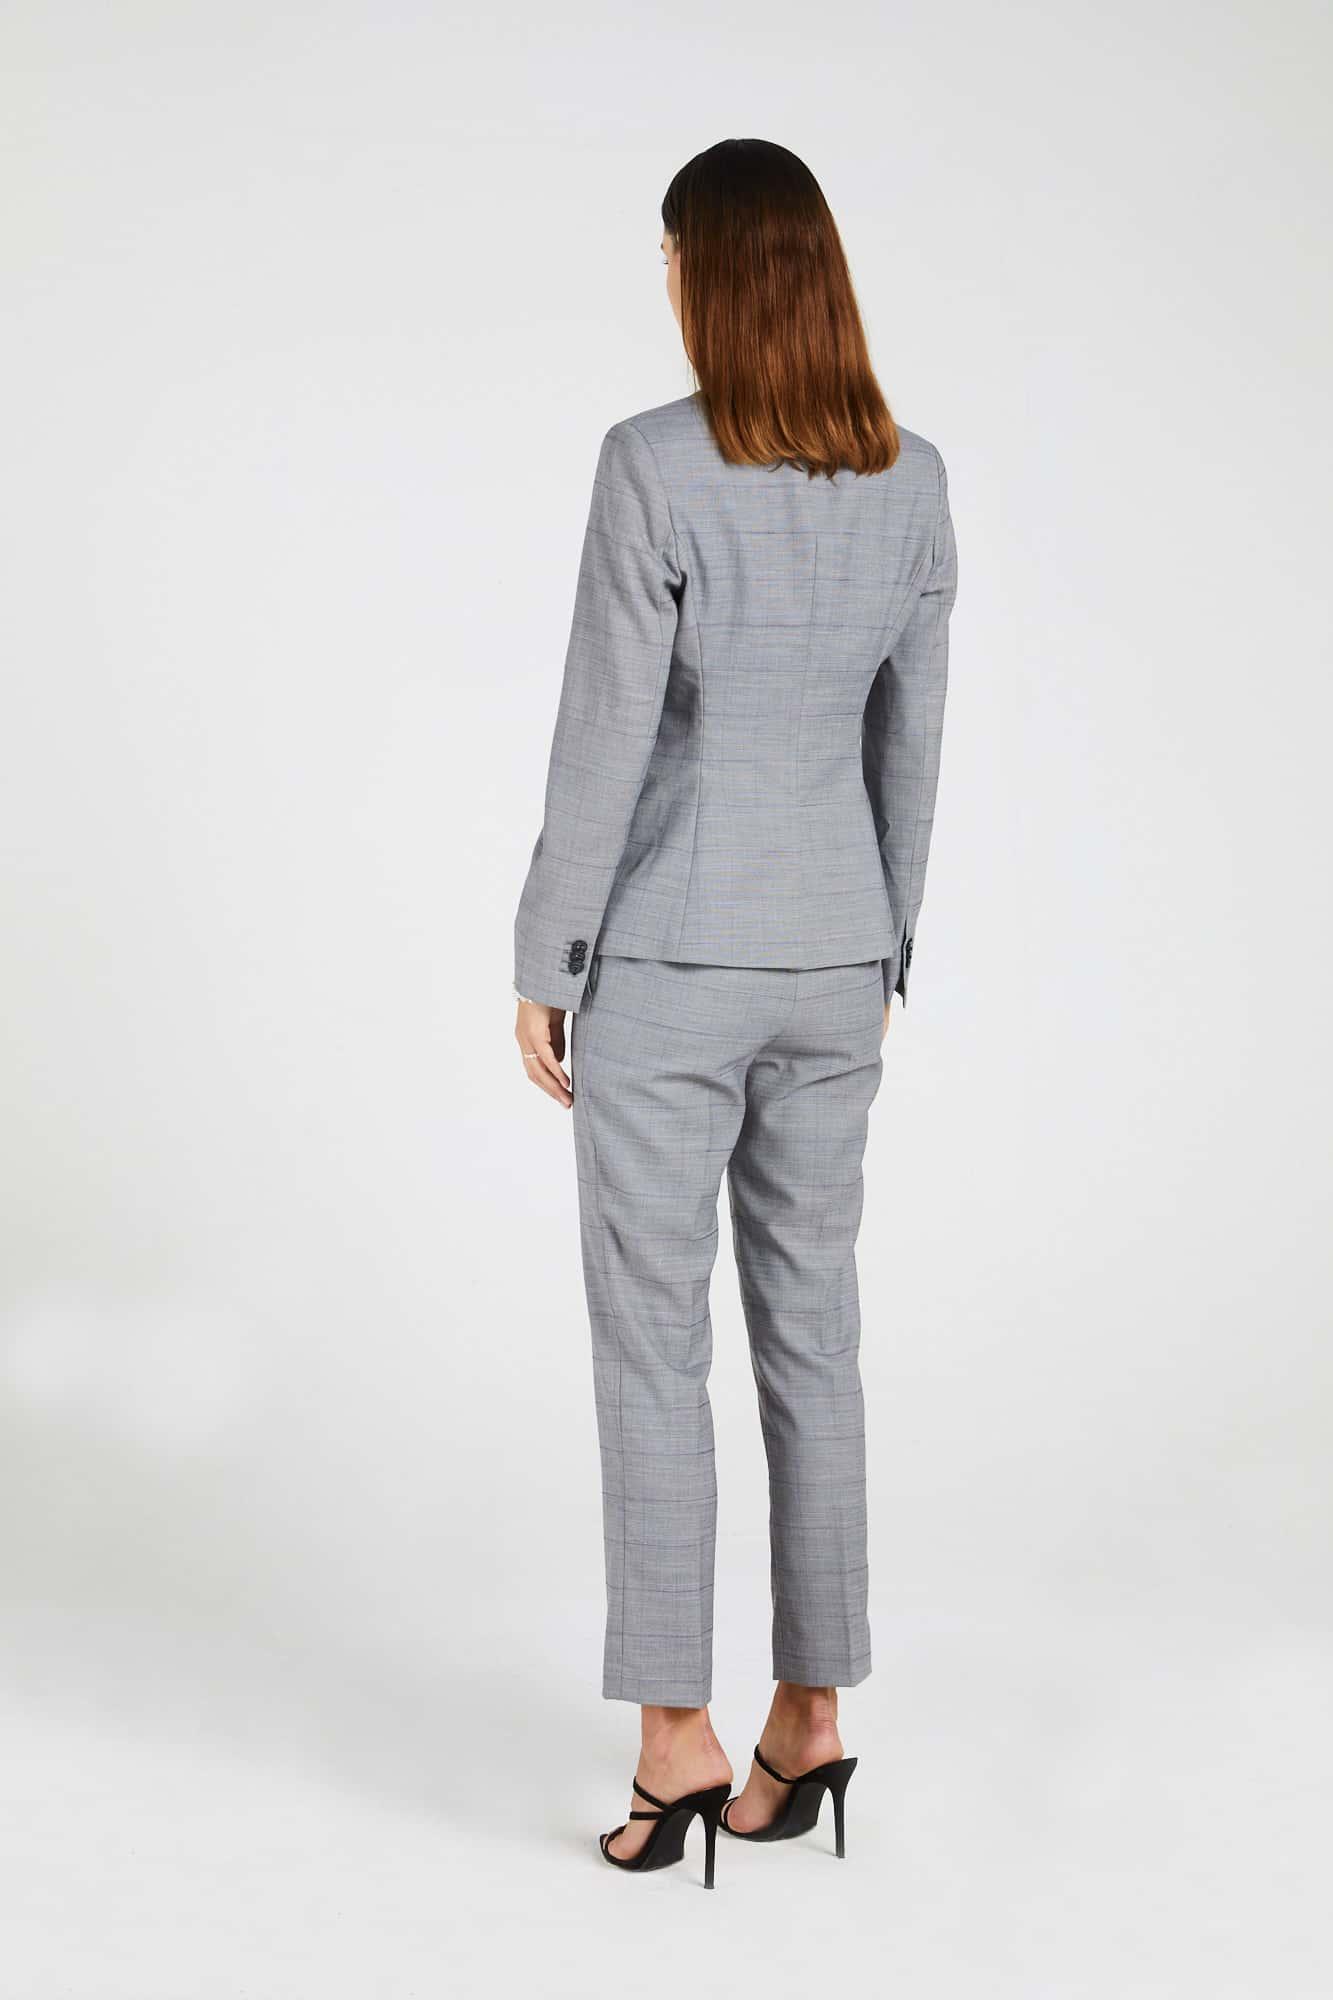 InStitchu Collection The Fraser Pastel Purple Windowpane Grey Jacket